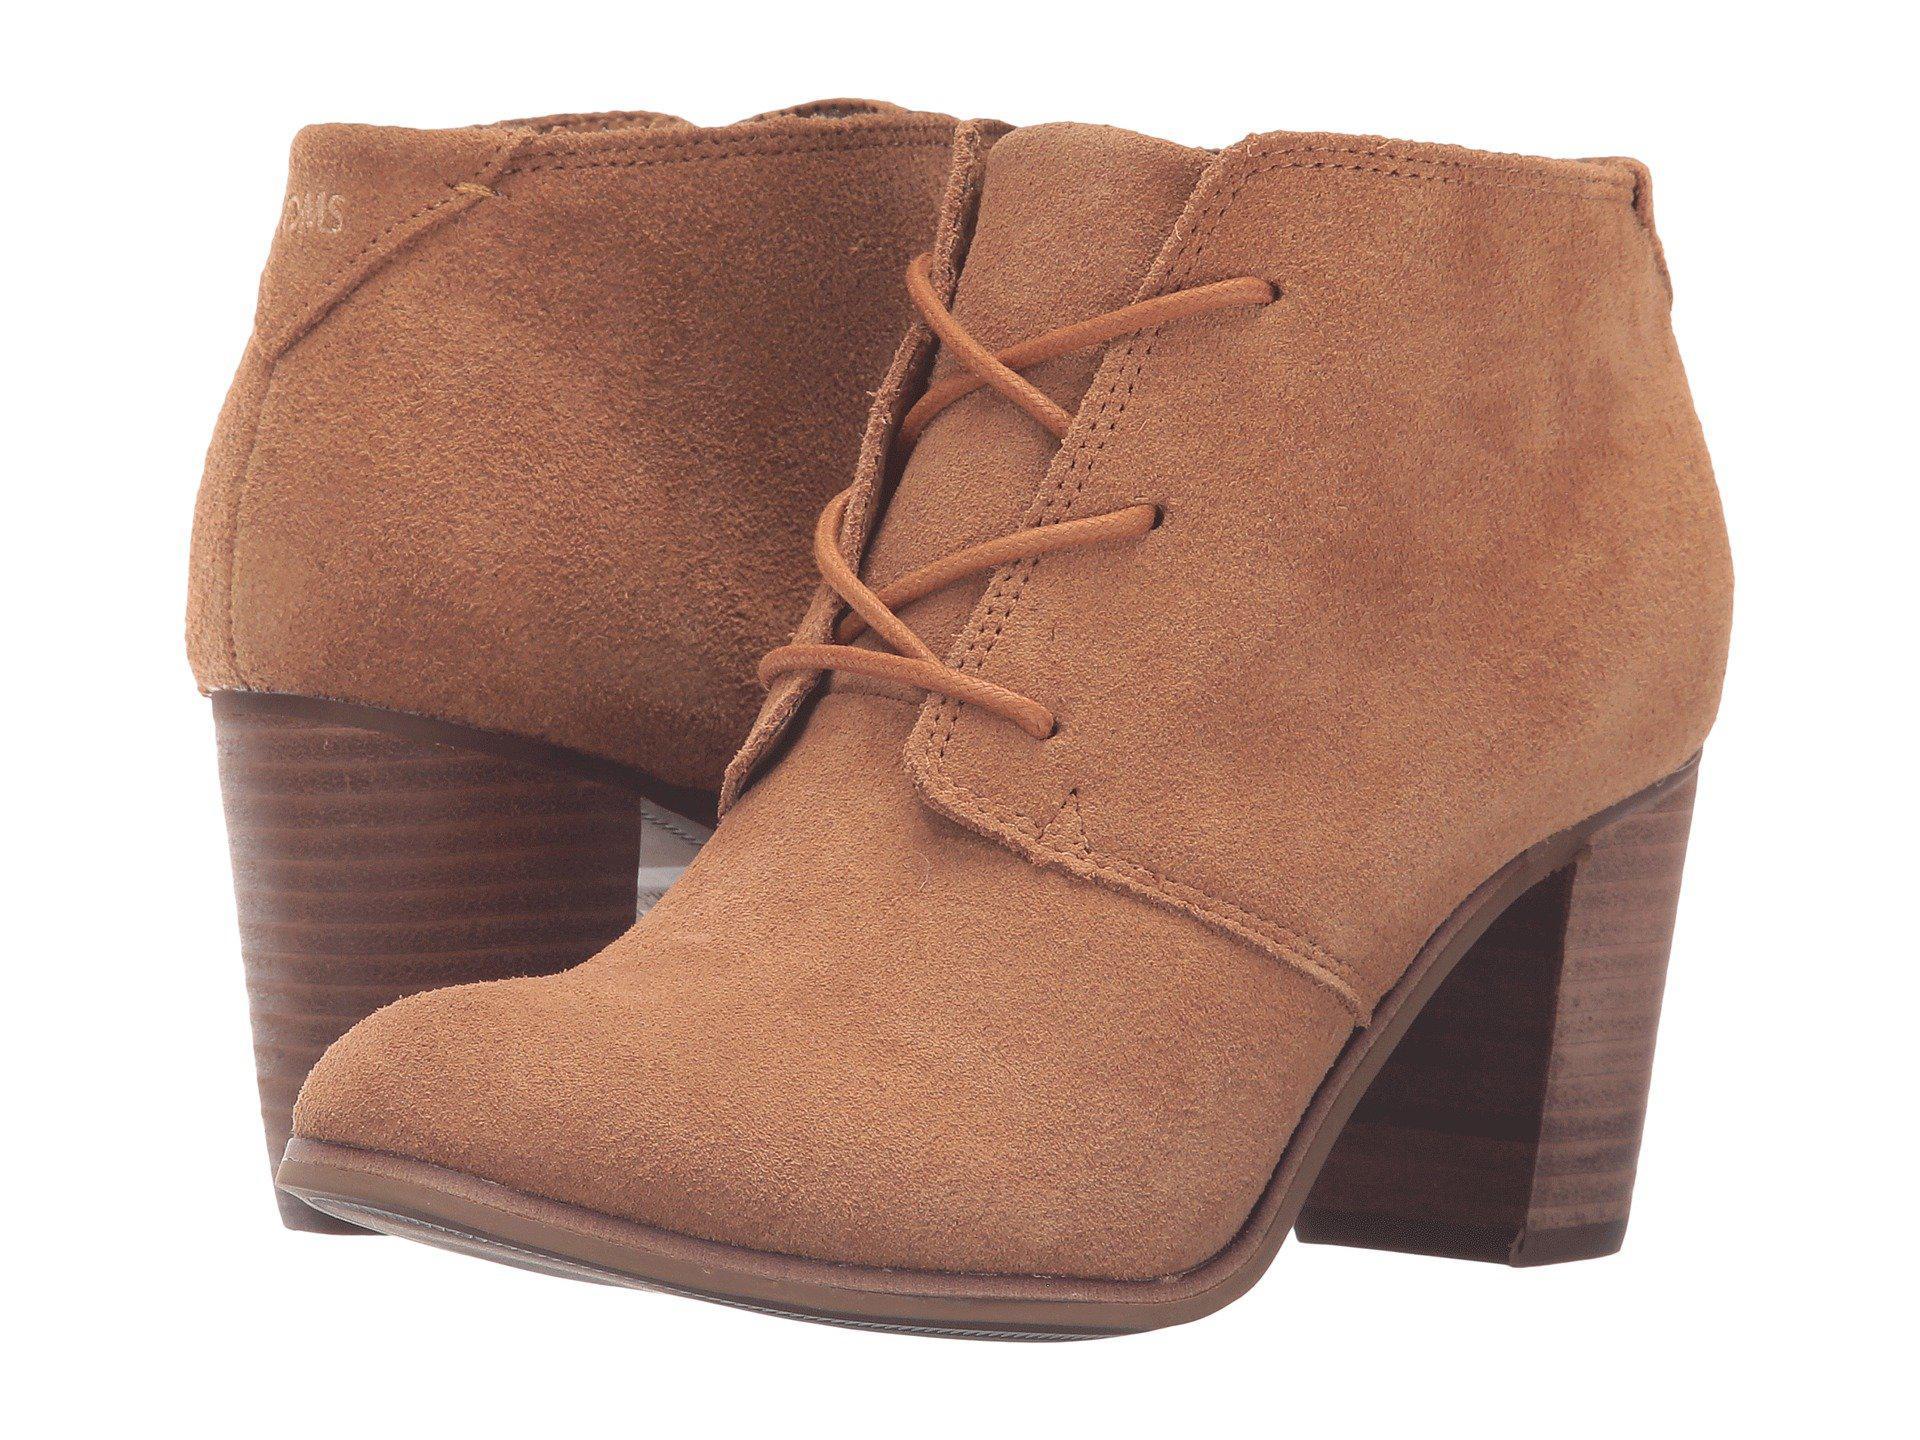 b50f251e987 Lyst - TOMS Lunata Lace-up Bootie (wheat Suede) Women s Lace-up Boots